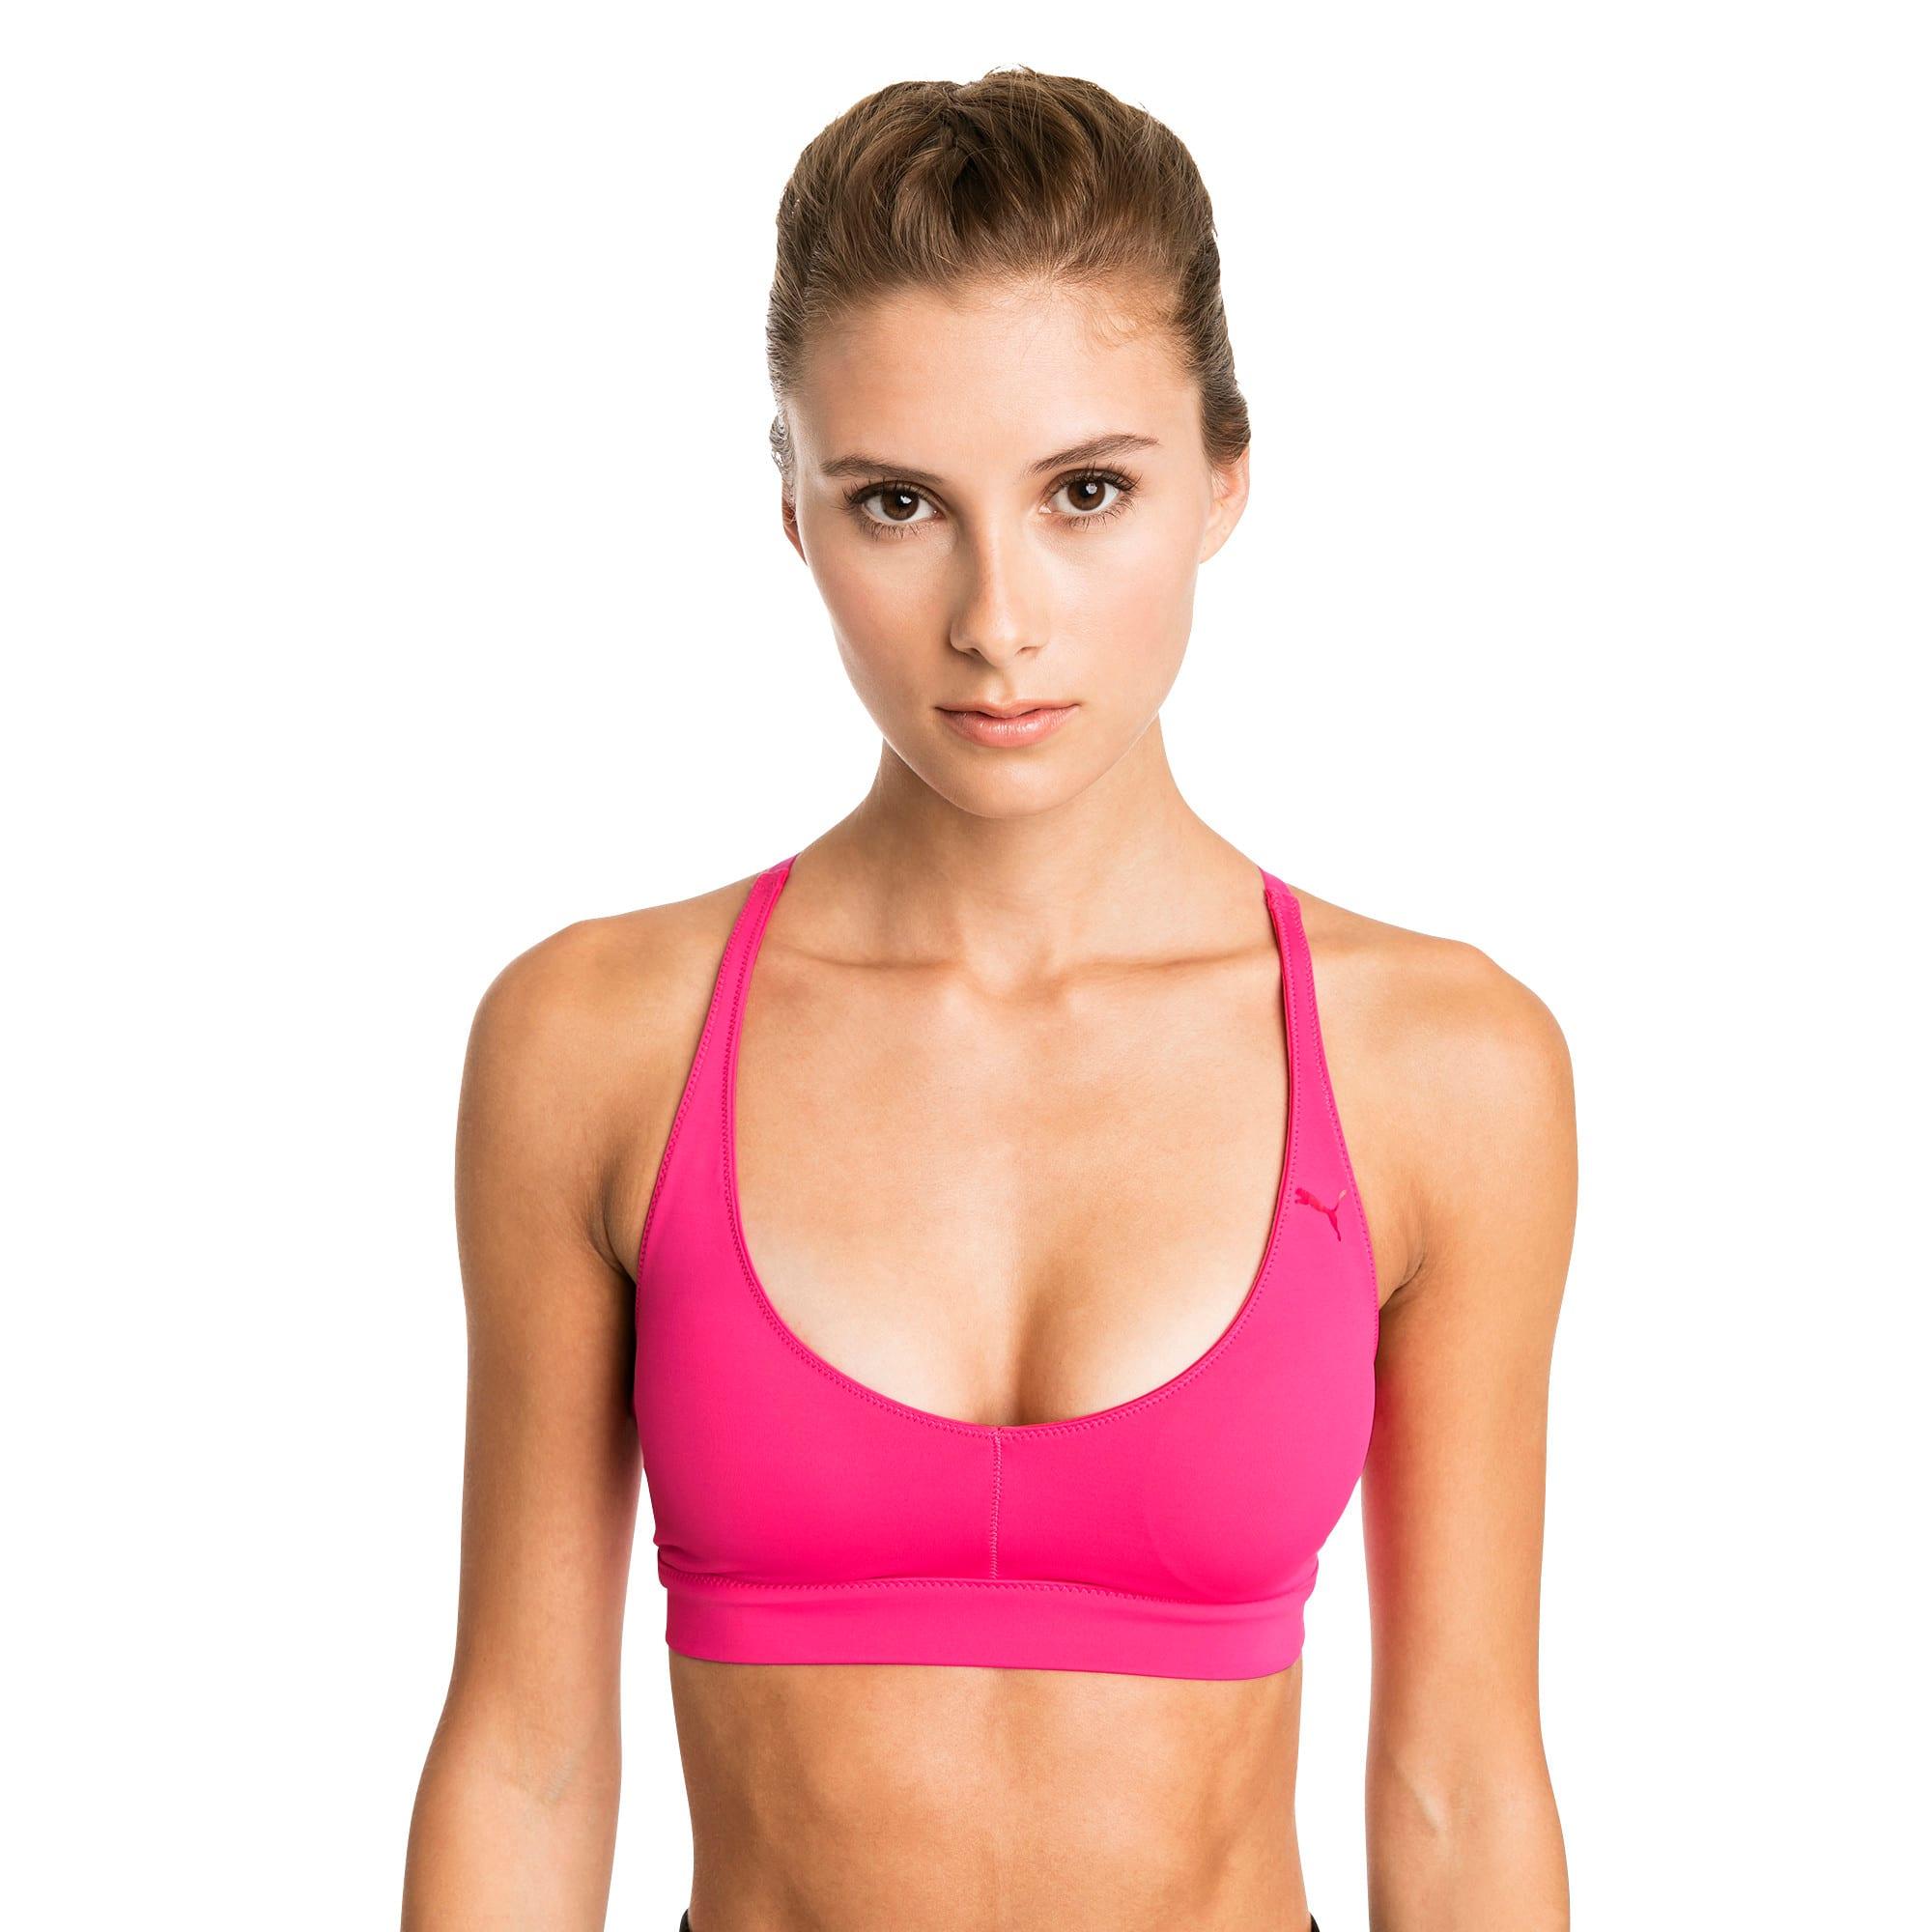 Thumbnail 1 of SpotLite Women's Low Impact Sports Bra, Fuchsia Purple, medium